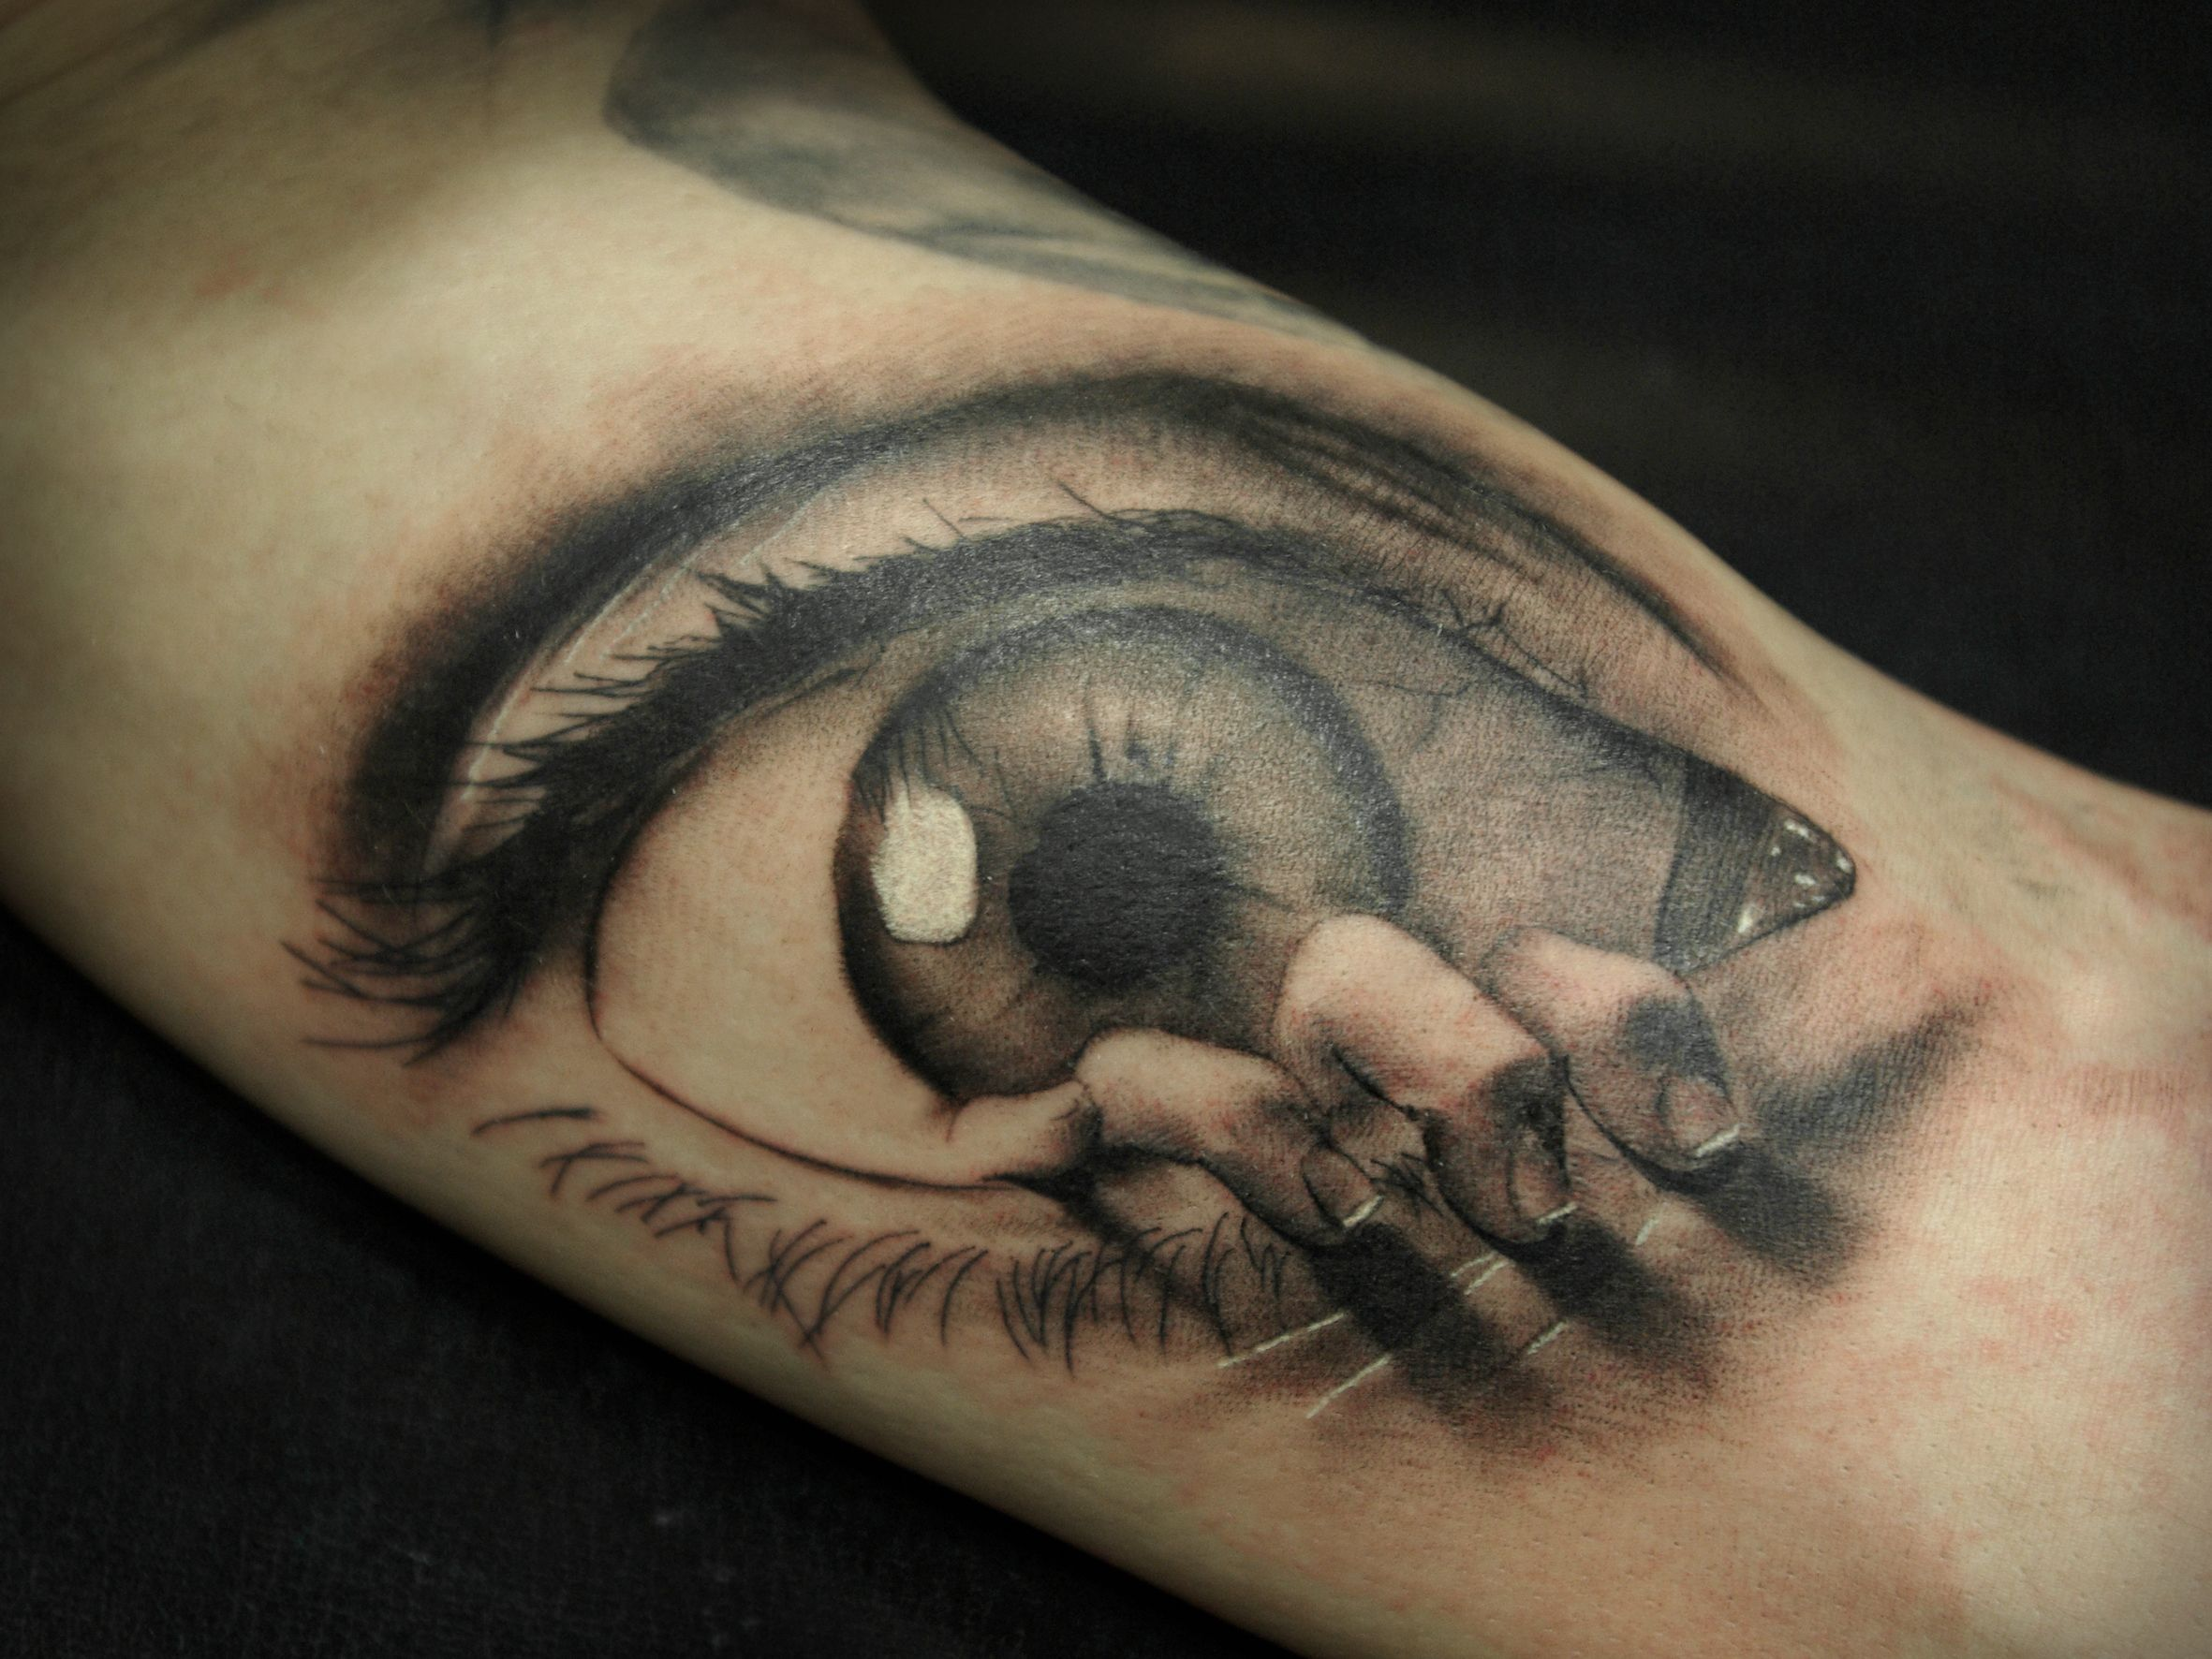 40 ultimate eye tattoo designs image source eyes tattoo eye tattoos tattoostime image source man with eye tattoo on head 50 crazy eye ta